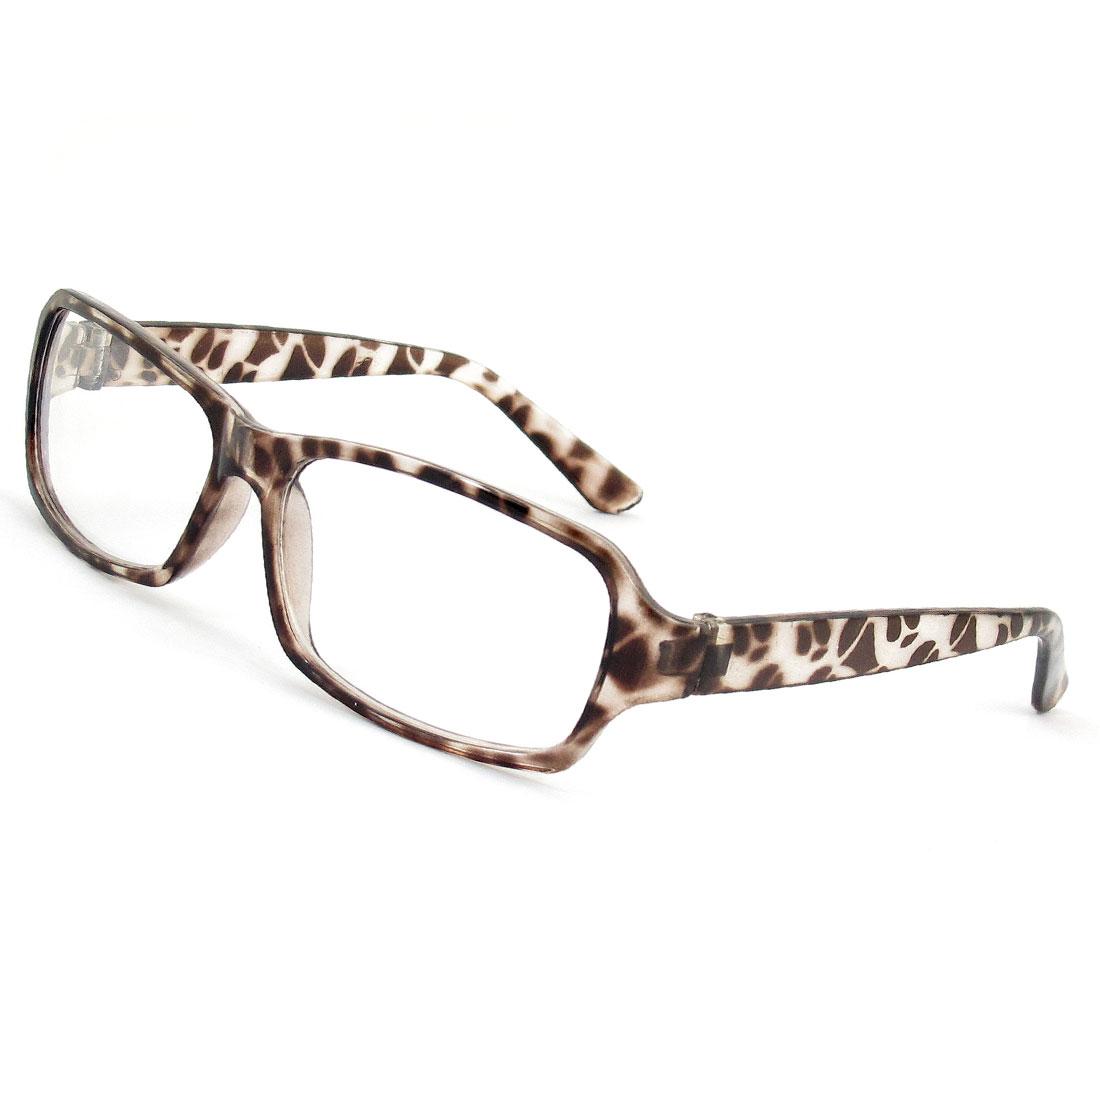 Dark Brown Plastic Full Frame Leopard Prints Plain Glasses Spectacles for Lady